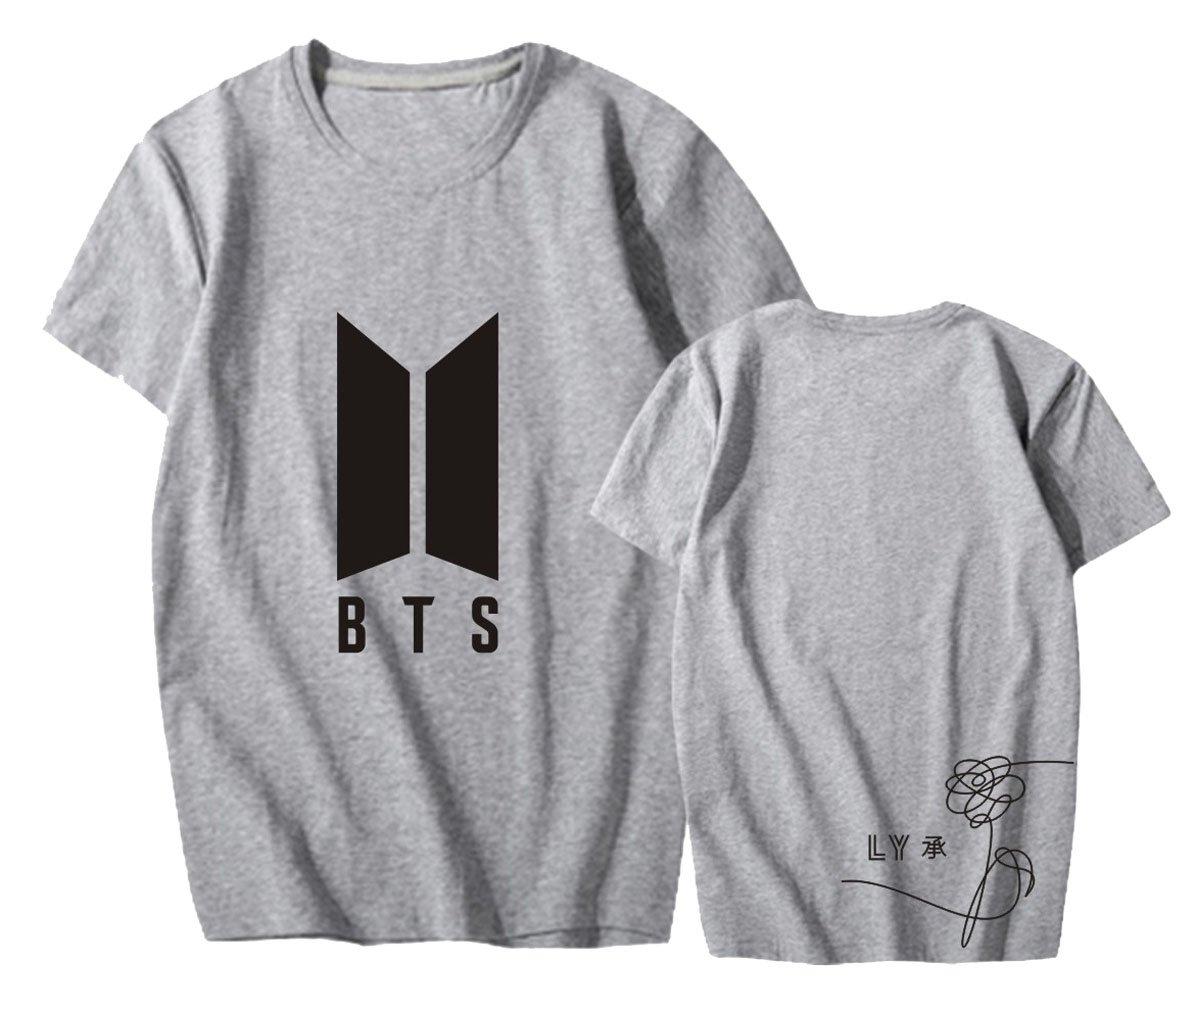 ALLDECOR BTS Love Yourself Printed Short Sleeve T-Shirt Unisex Cotton Loose Tee